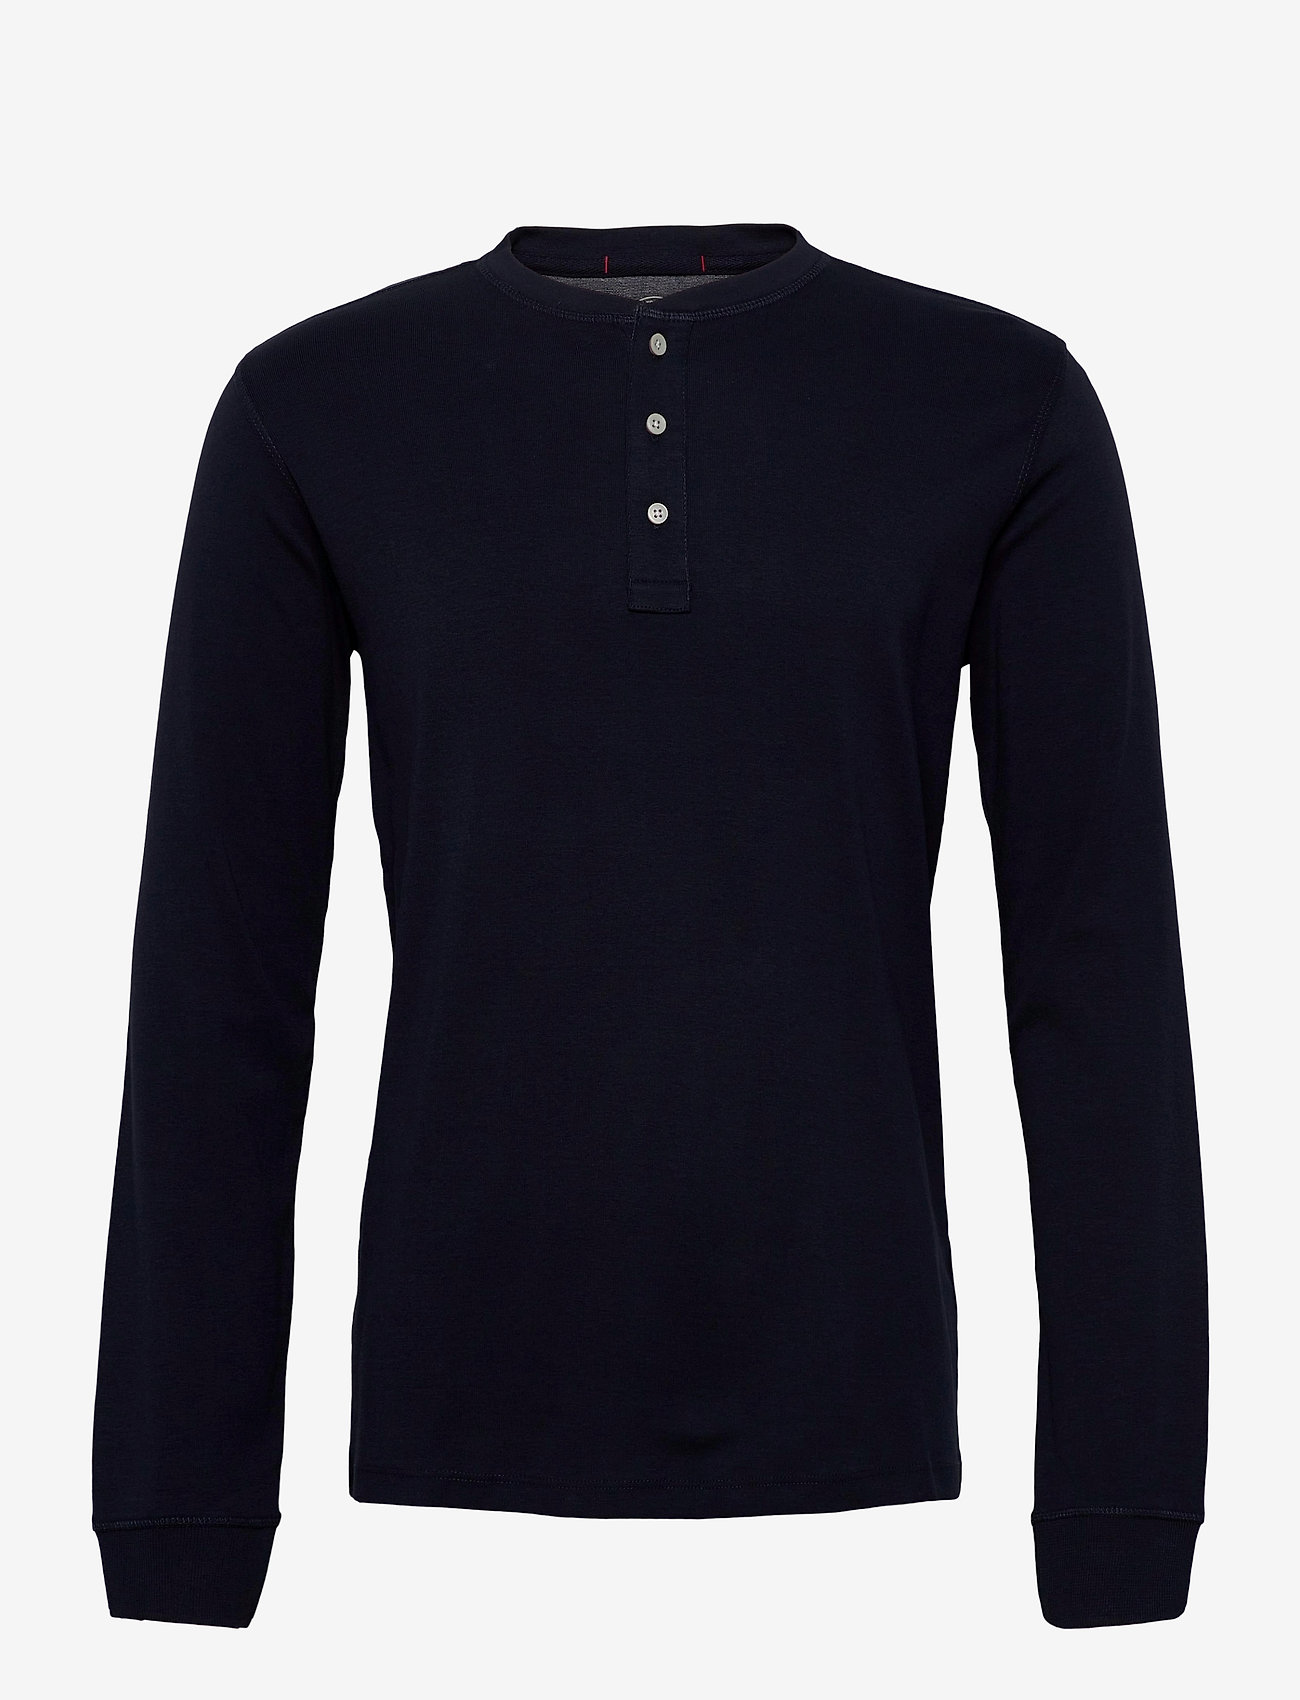 Lindbergh Ribbed granddad L/S - T-skjorter NAVY - Menn Klær